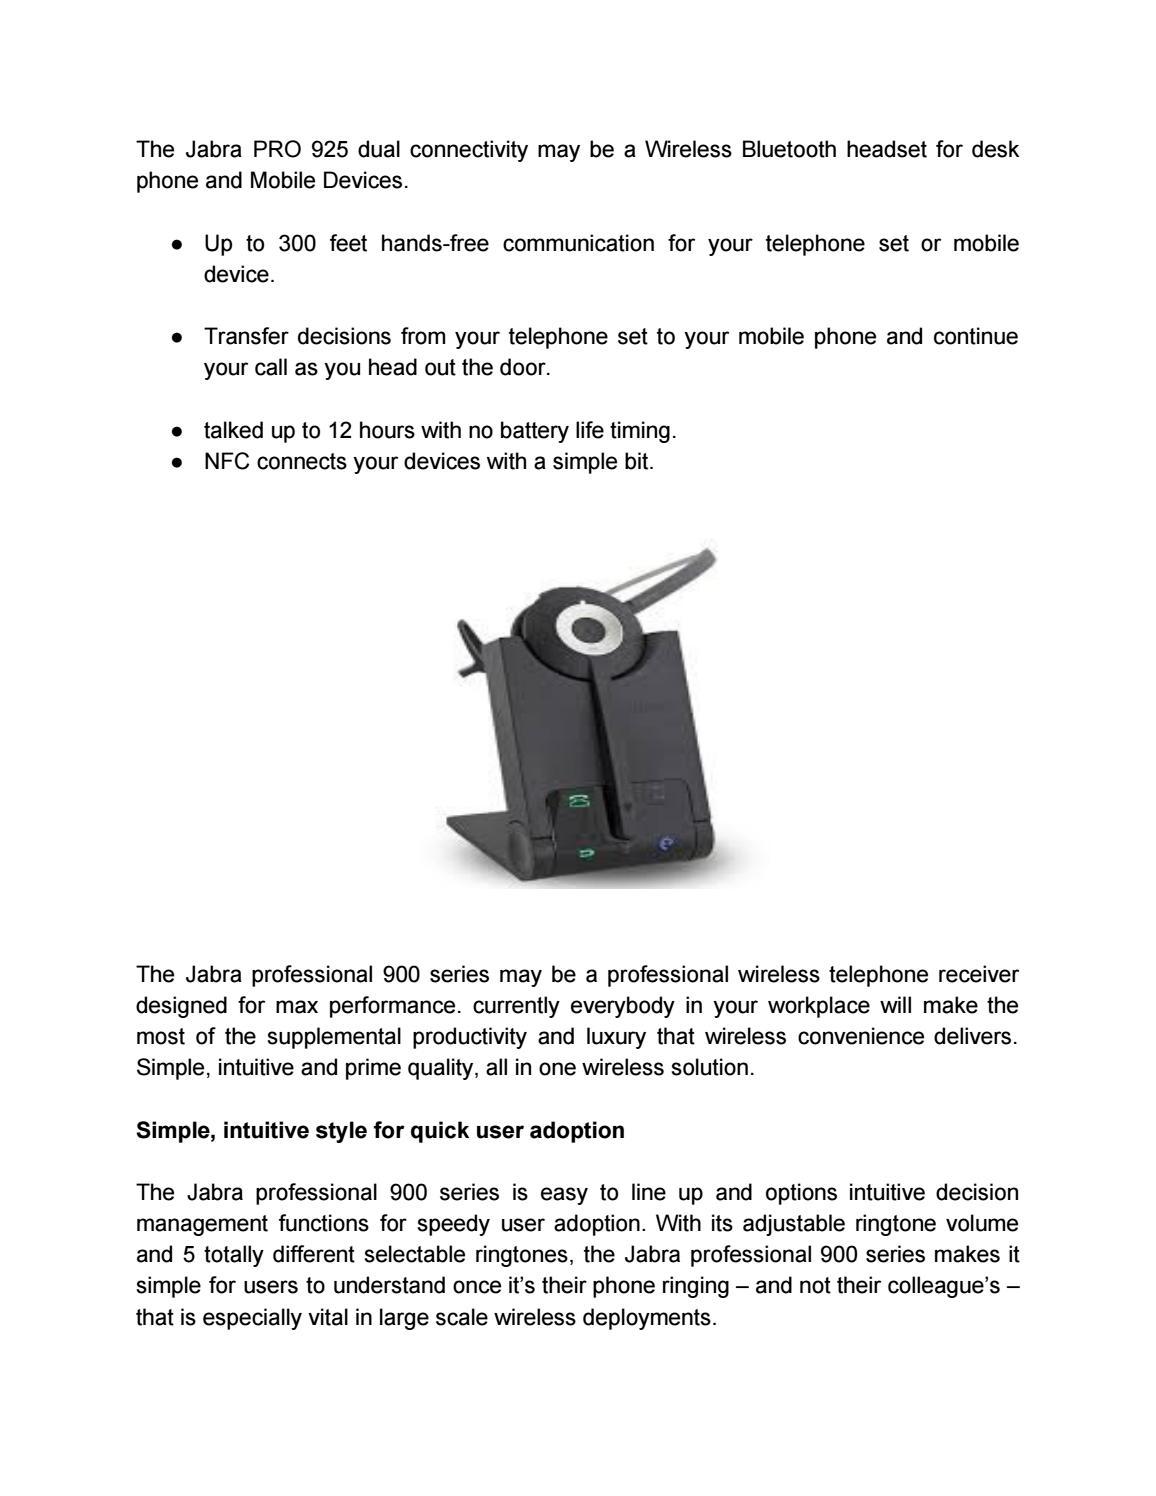 Pro 925 Bt Jabra Pro 925 Wireless Bluetooth Mono Headset Dual Connectivity By Fragrancejohn Issuu